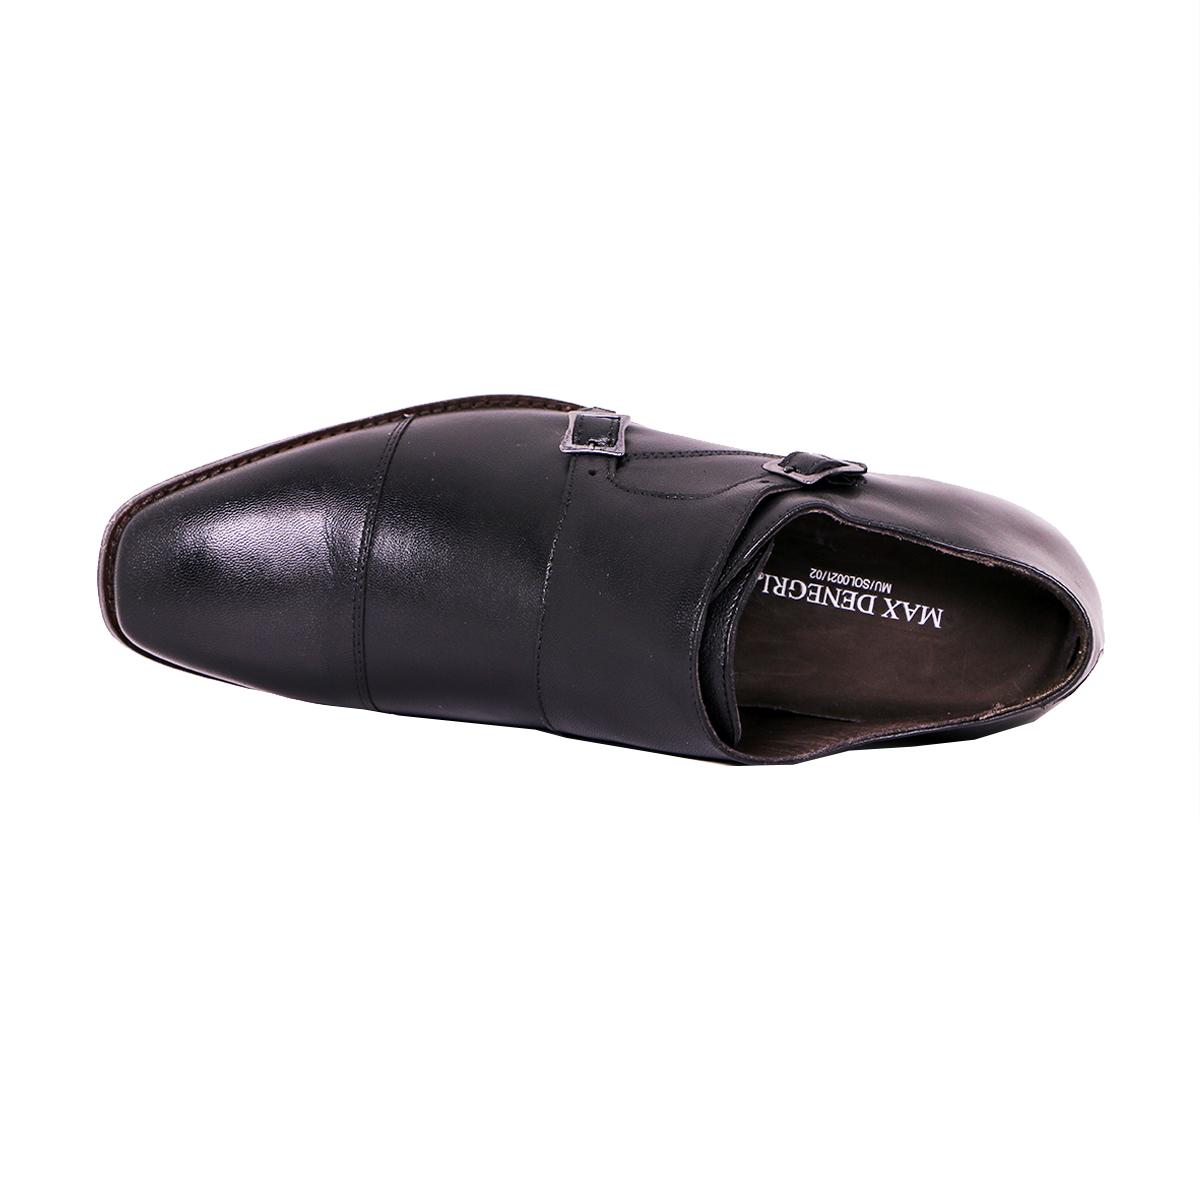 Zapato Formal Lawyers Negro Max Denegri +7cms De Altura_72814